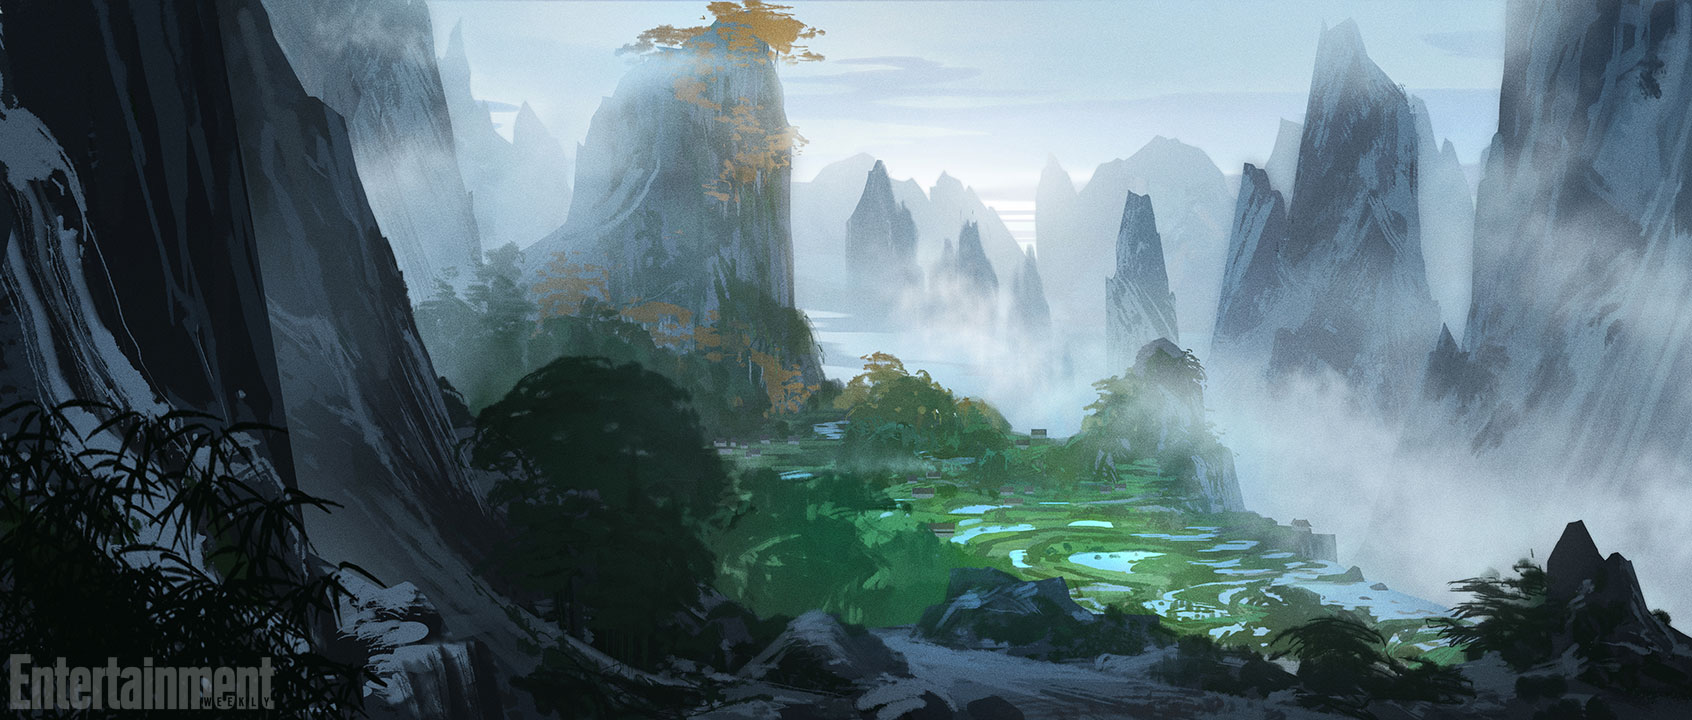 Breathtaking Kung Fu Panda 3 Concept Art Reveals Panda